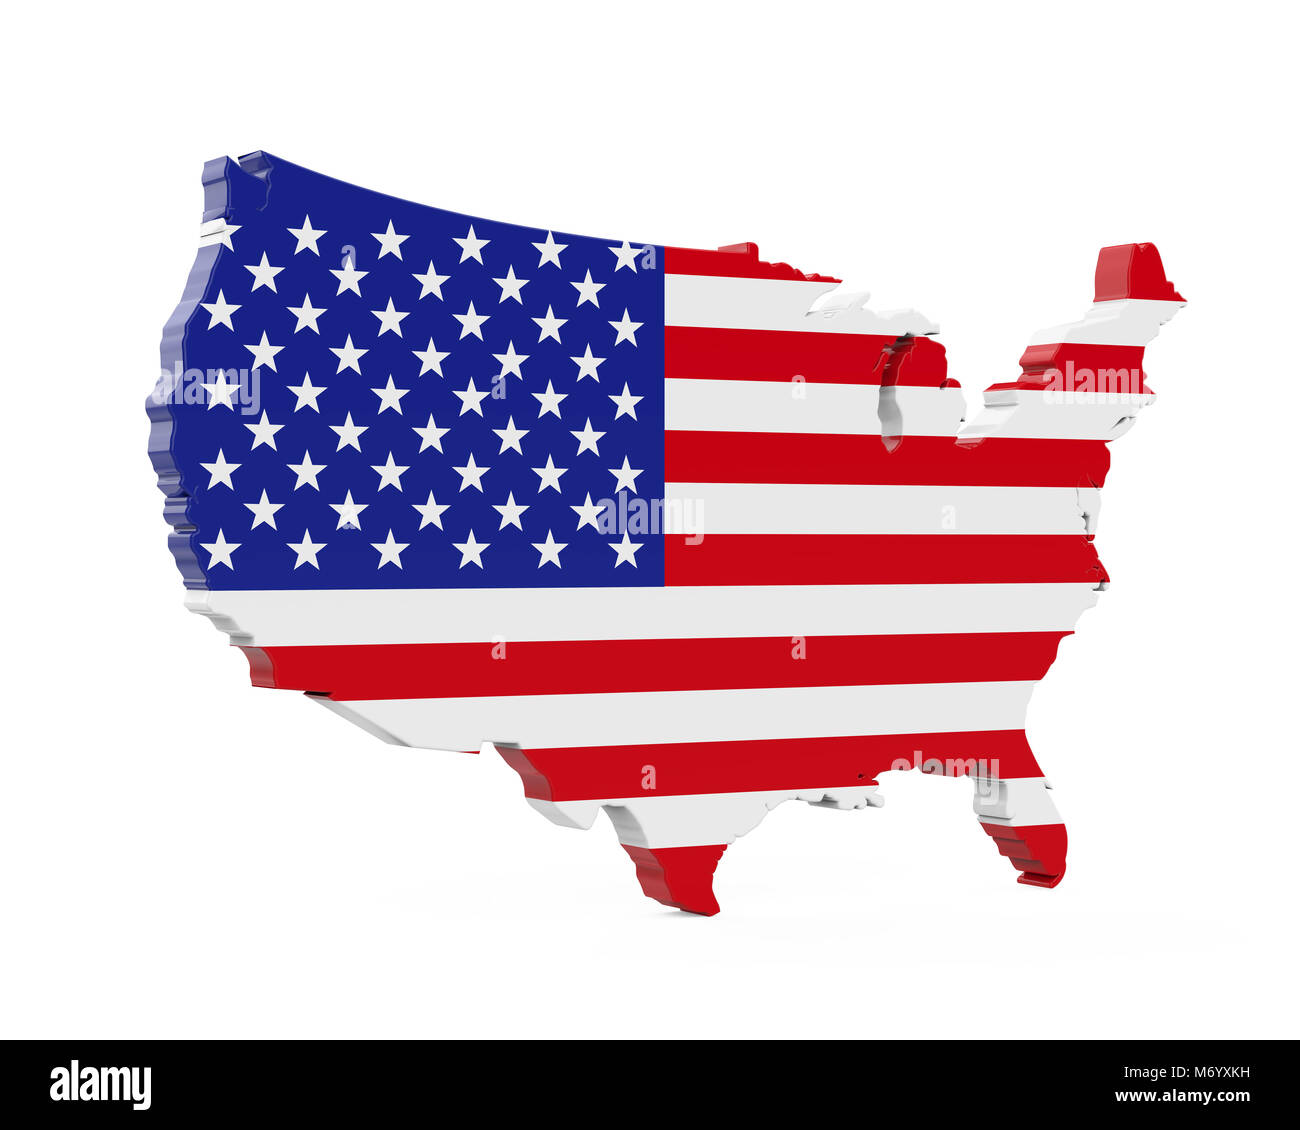 United States of America Map Flag Stock Photo: 176405253 - Alamy